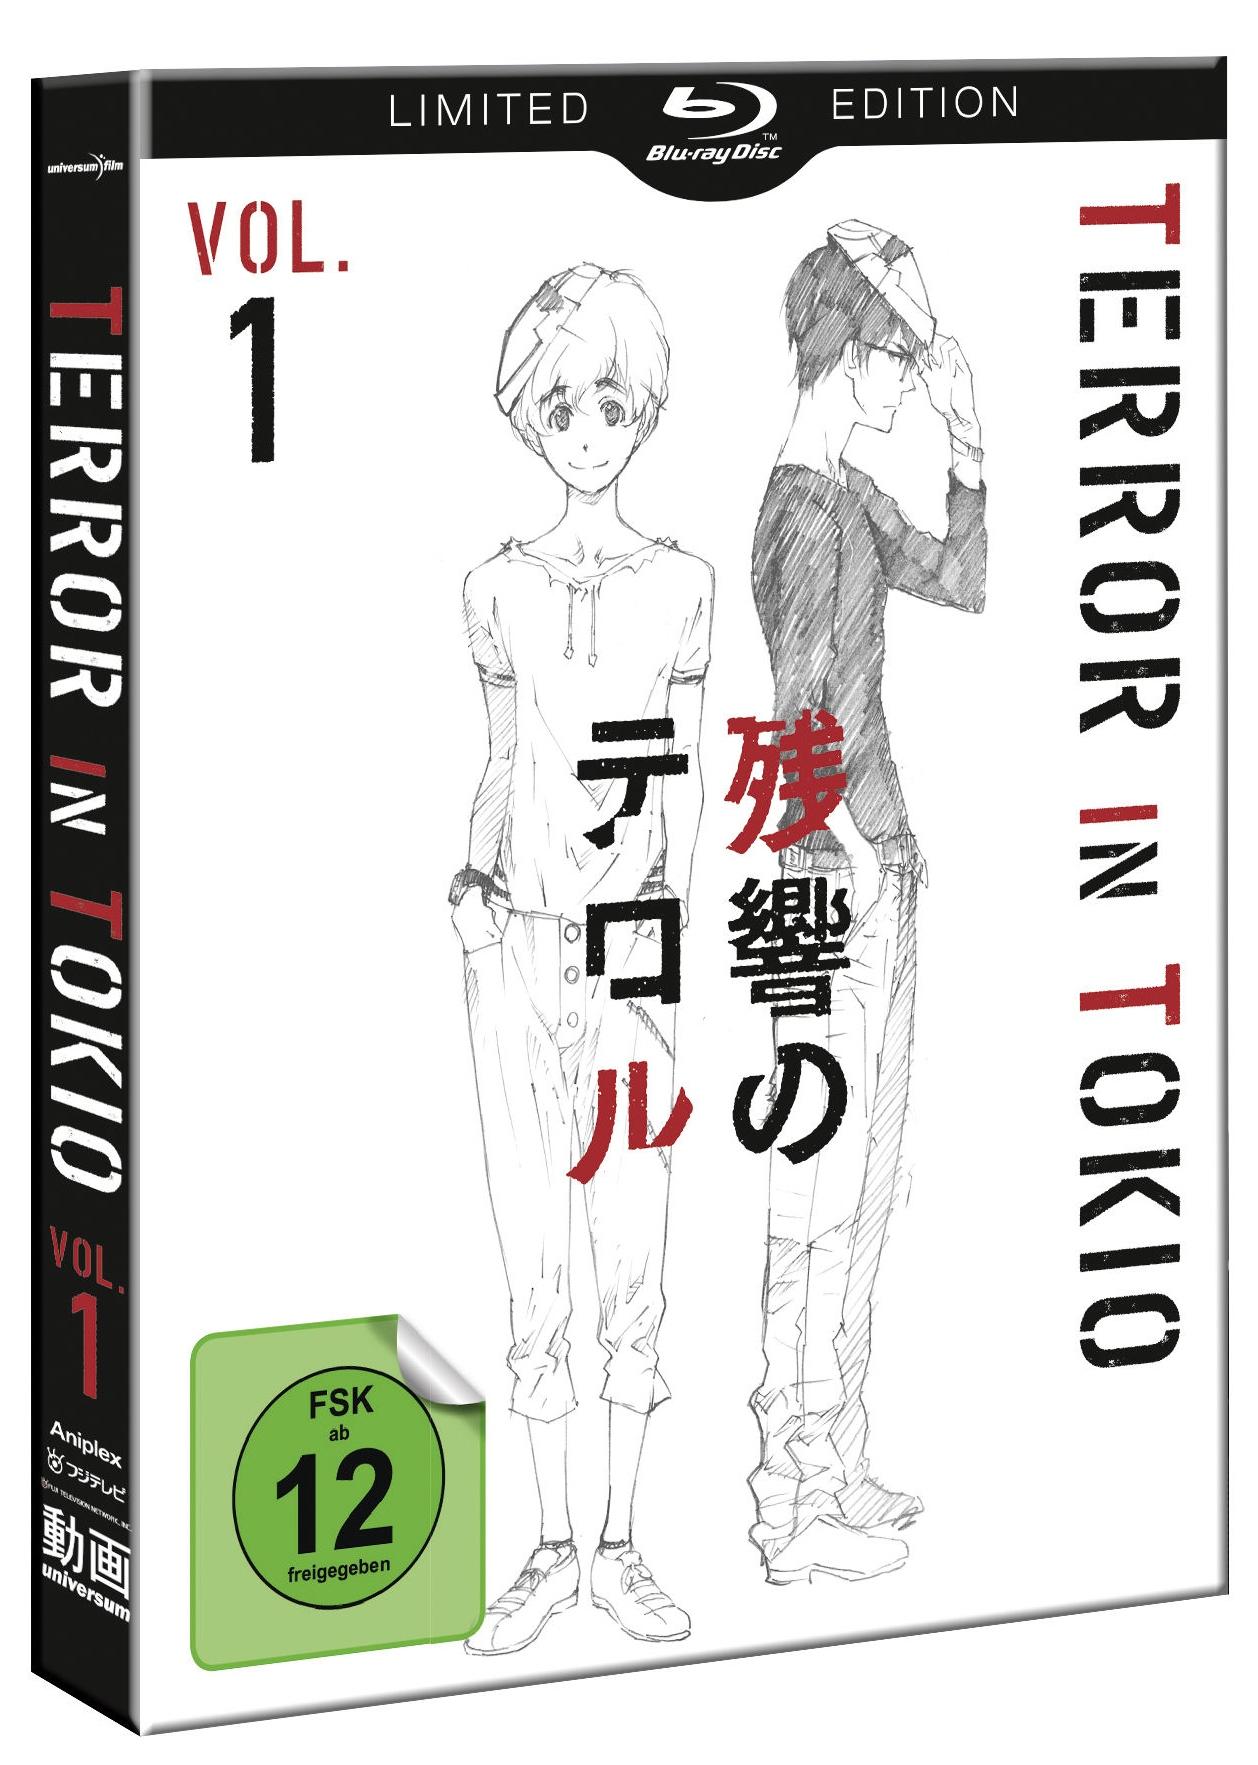 Terror_in_Tokio_Vol_1_BD_Limited_Special_Edition_Bluray_888750152893_3D.72dpi